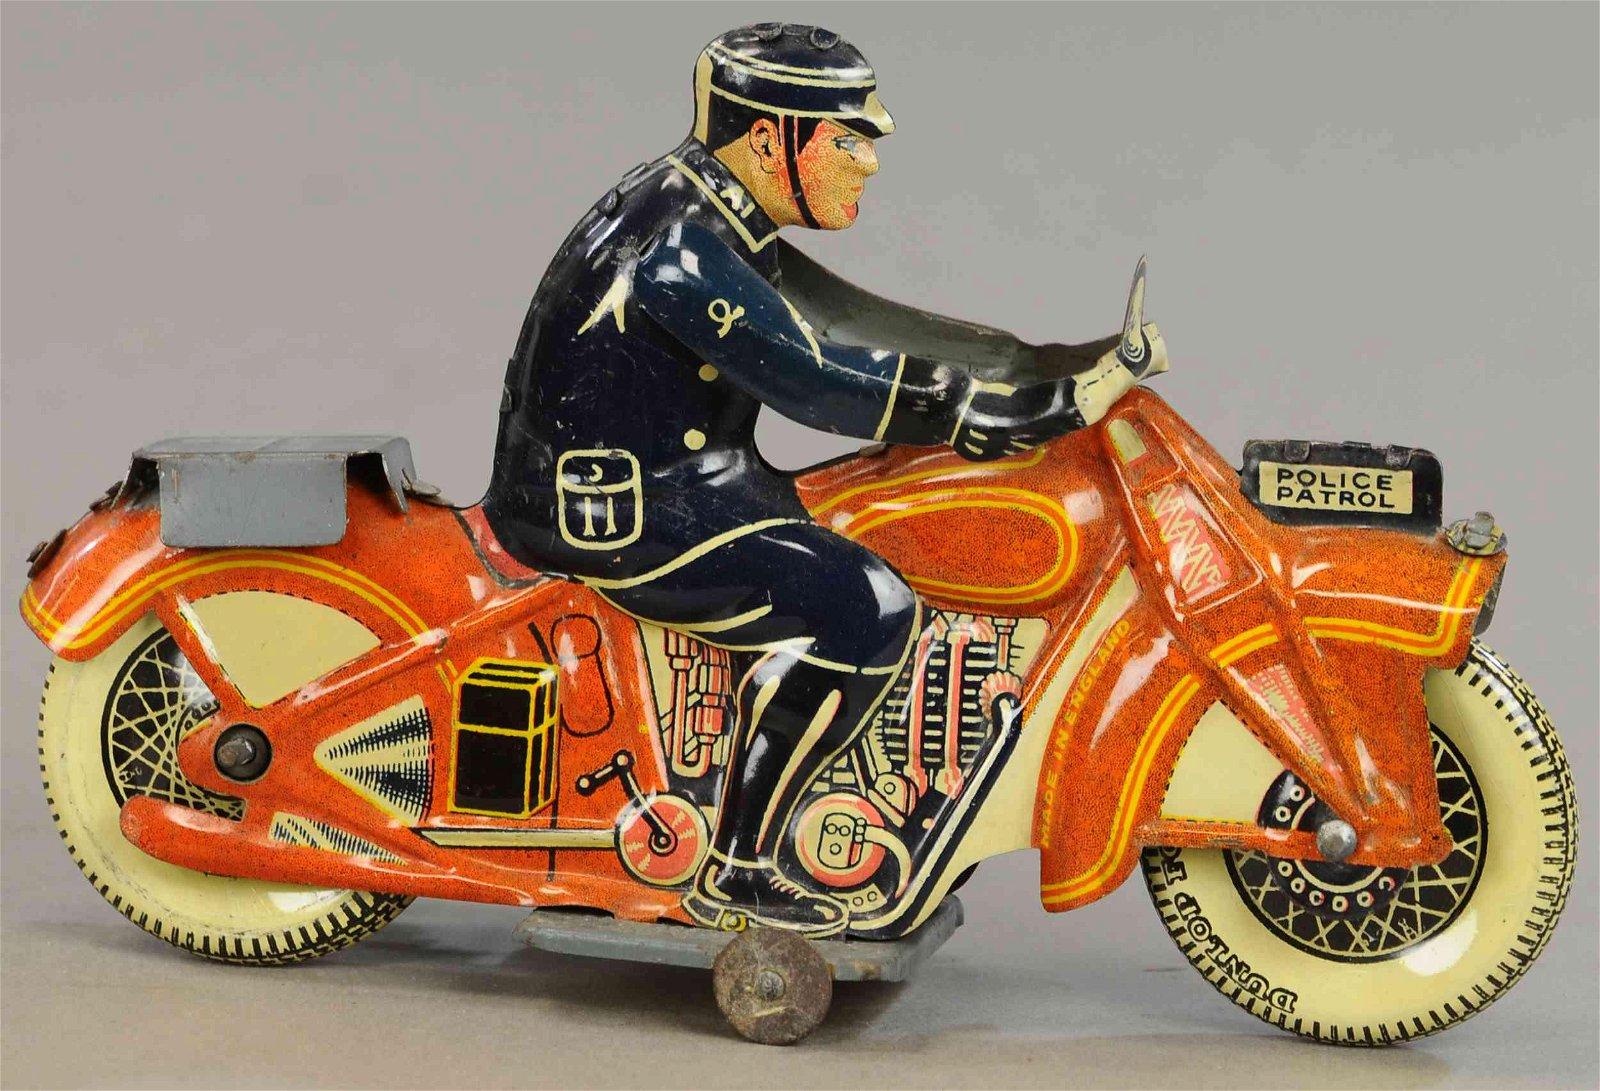 METTOY POLICE PATROL MOTORCYCLE